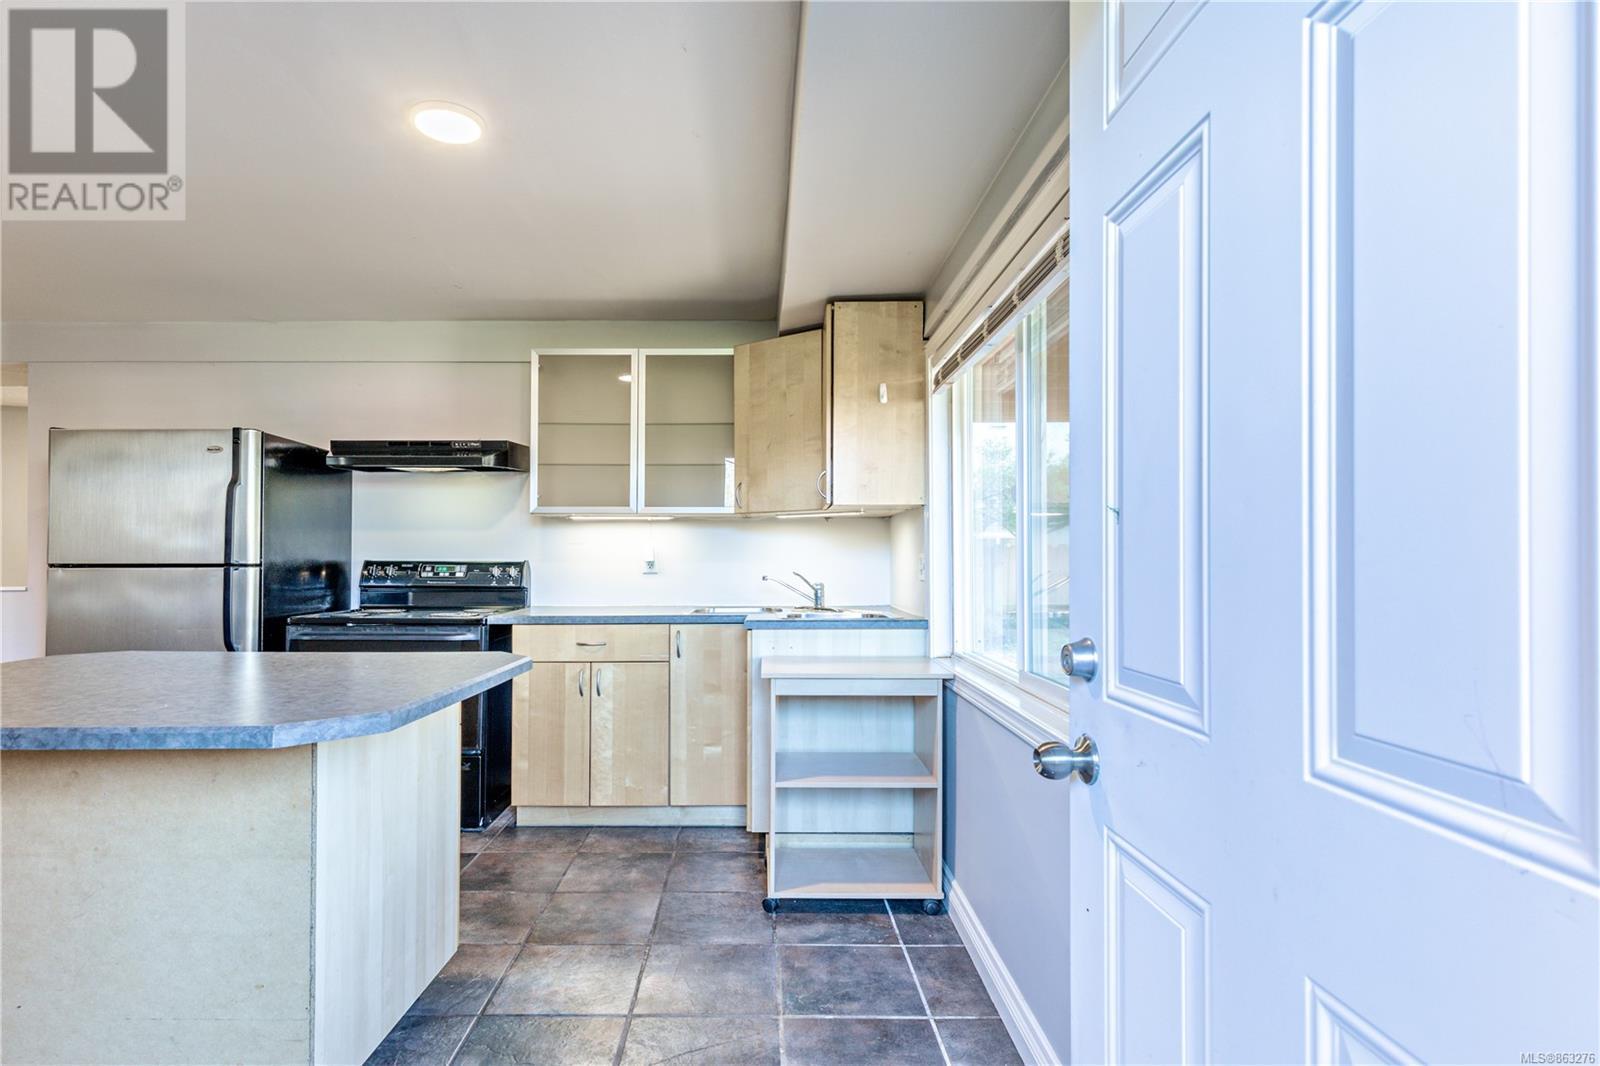 673 Winchester Ave, Nanaimo, British Columbia  V9R 4B6 - Photo 22 - 863276